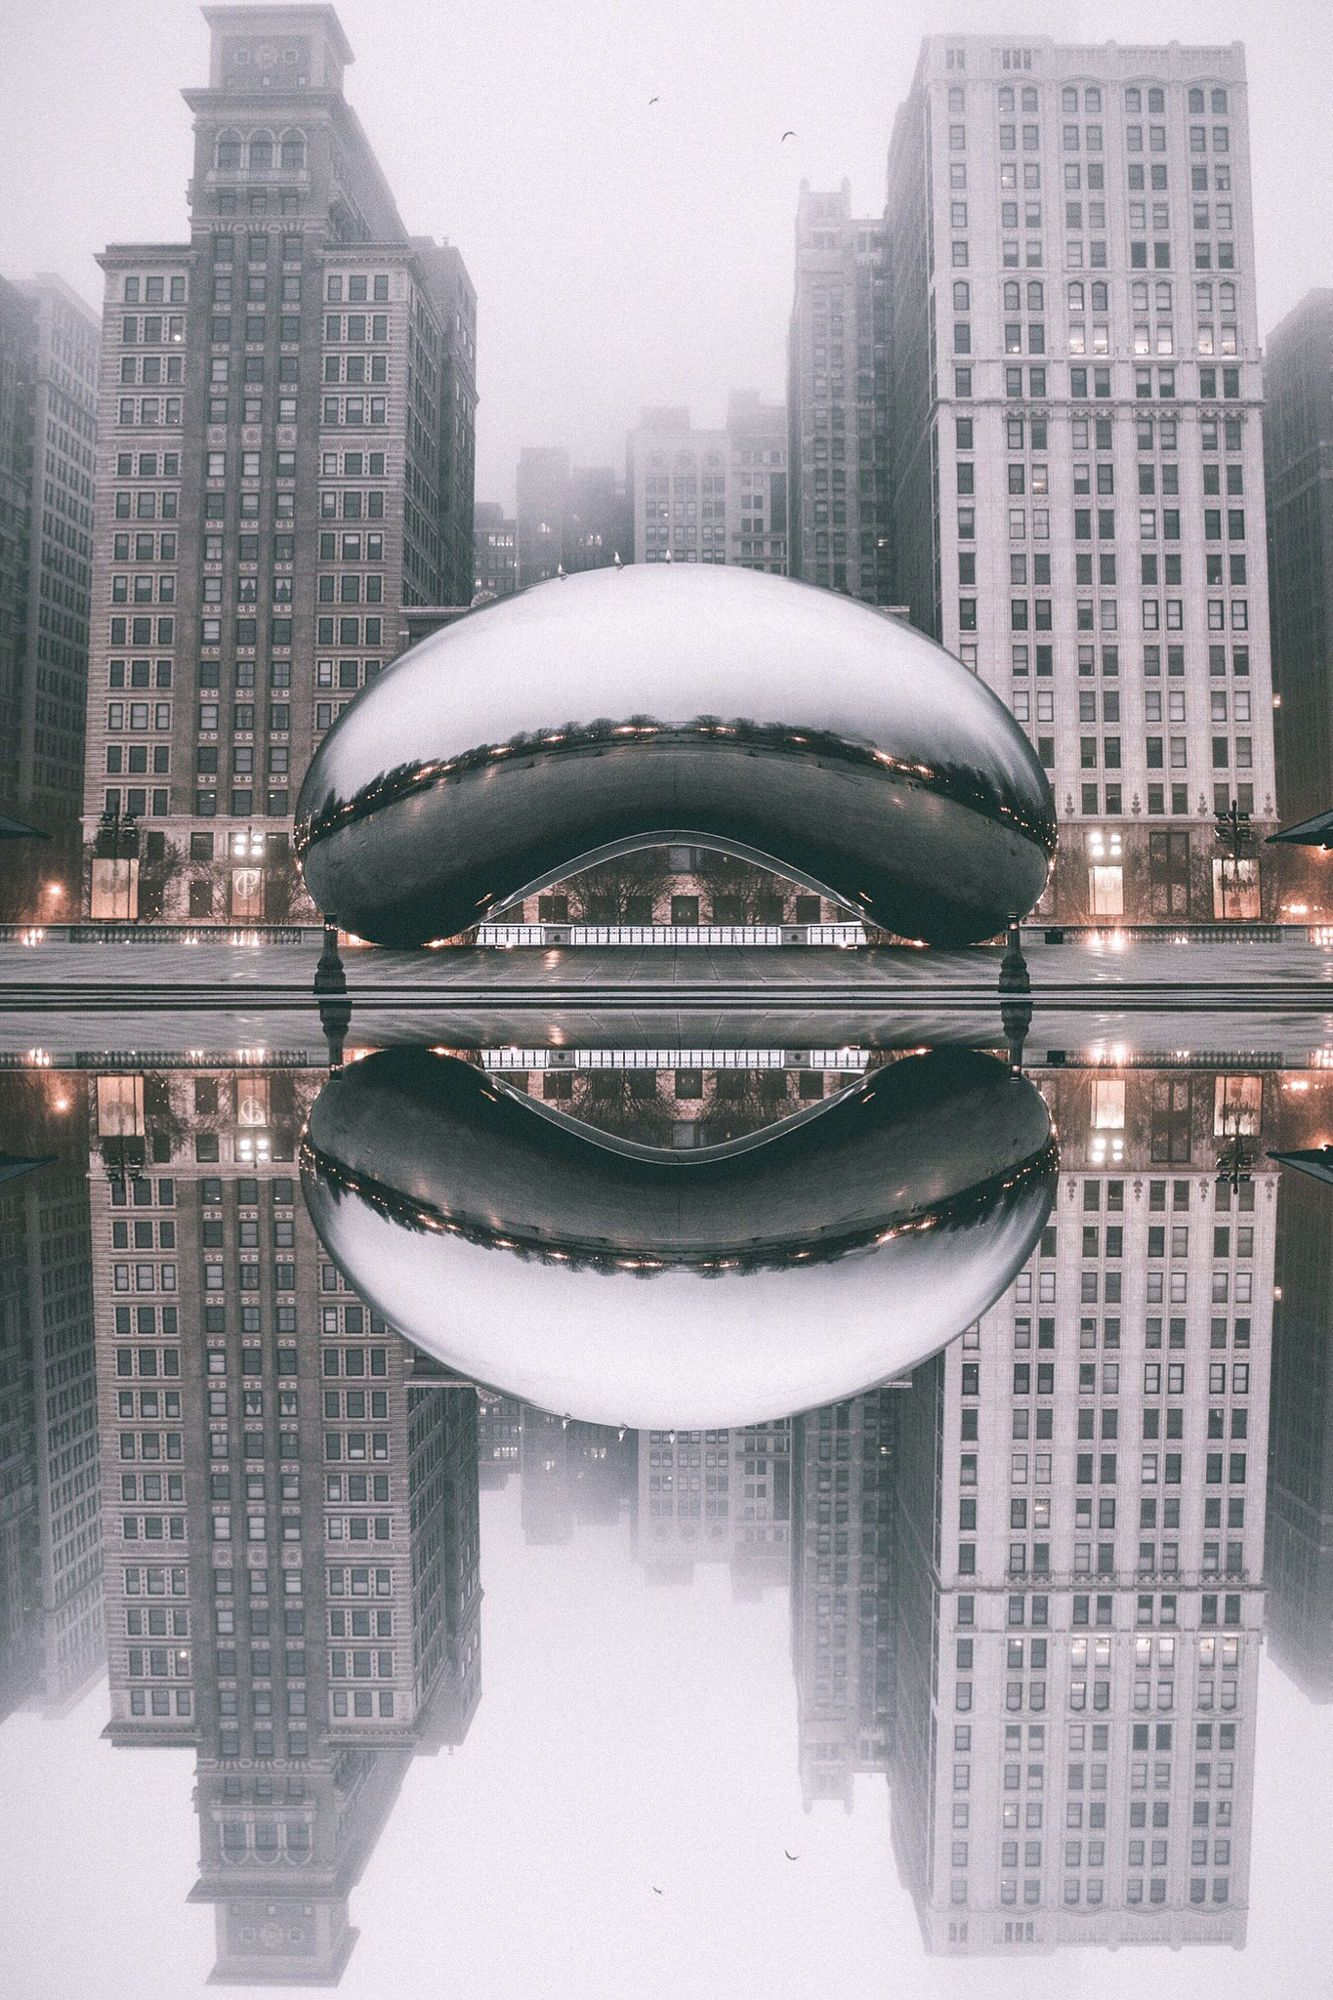 Reflection Chicago's famous sculpture 'Bean' or 'Cloud